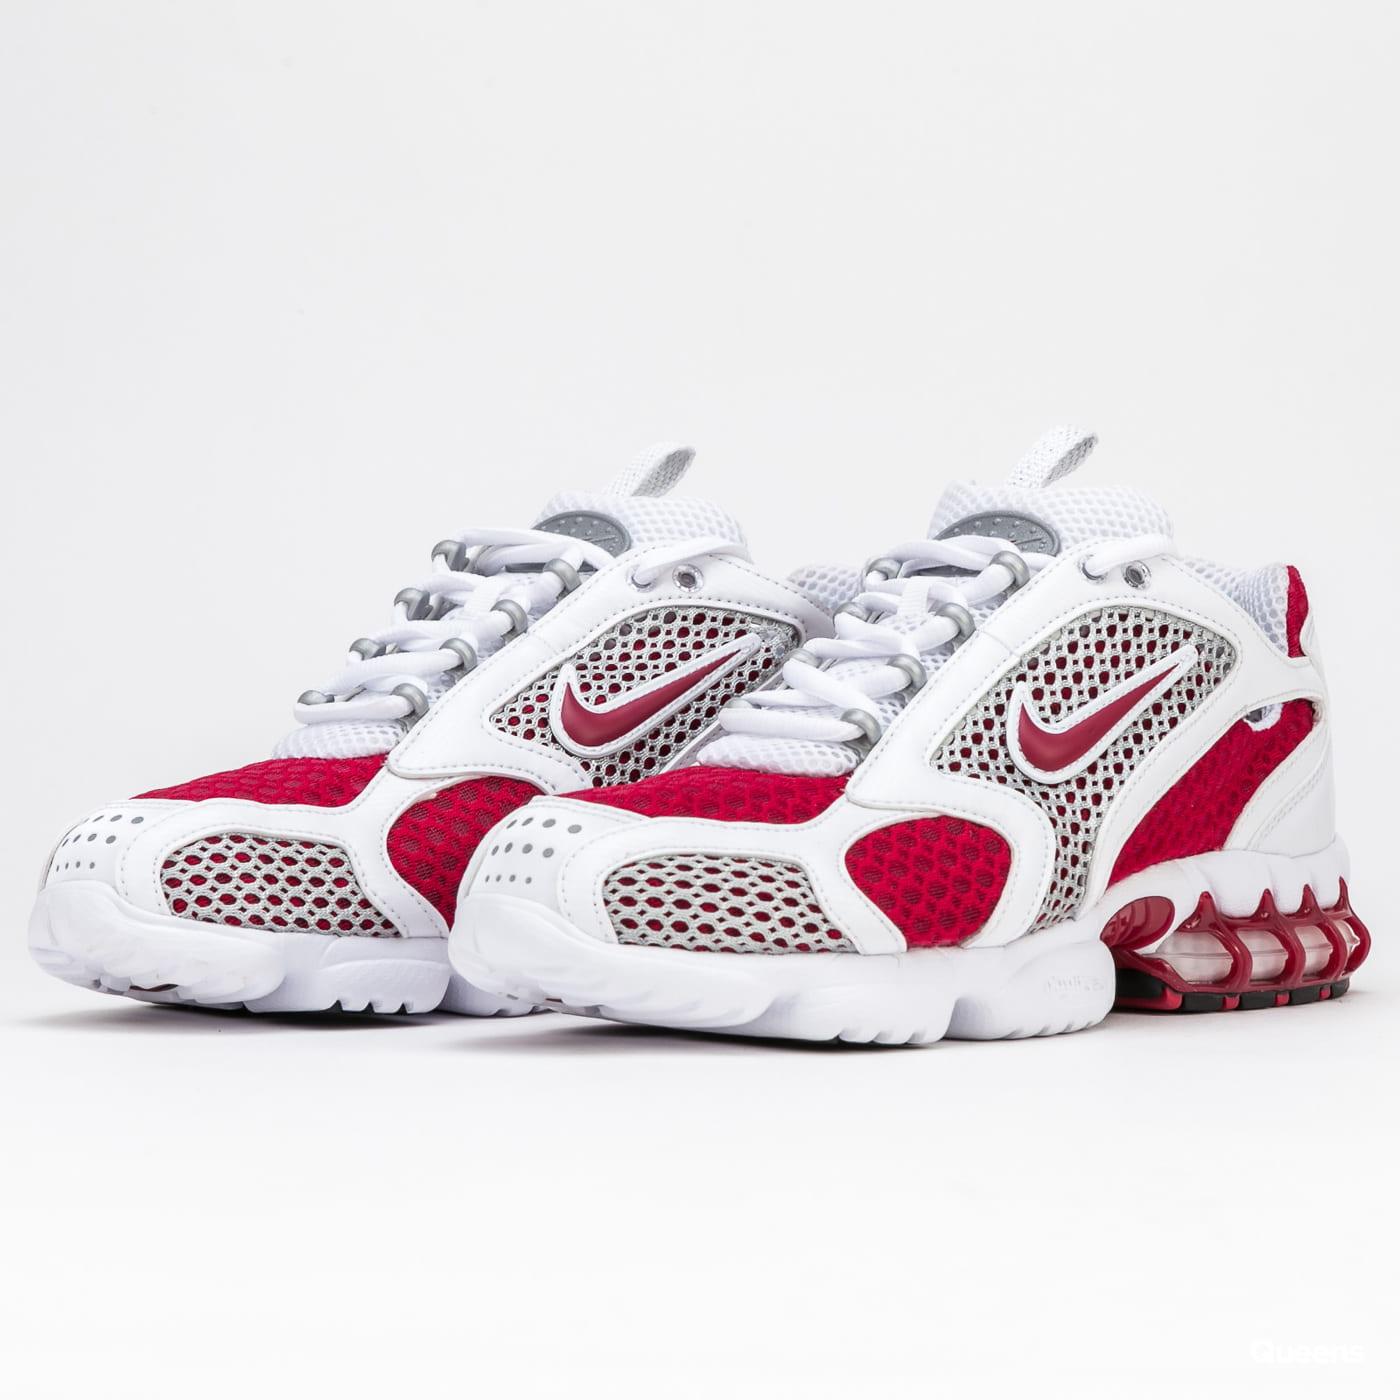 Nike W Air Zoom Spiridon Cage 2 cardinal red / cardinal red